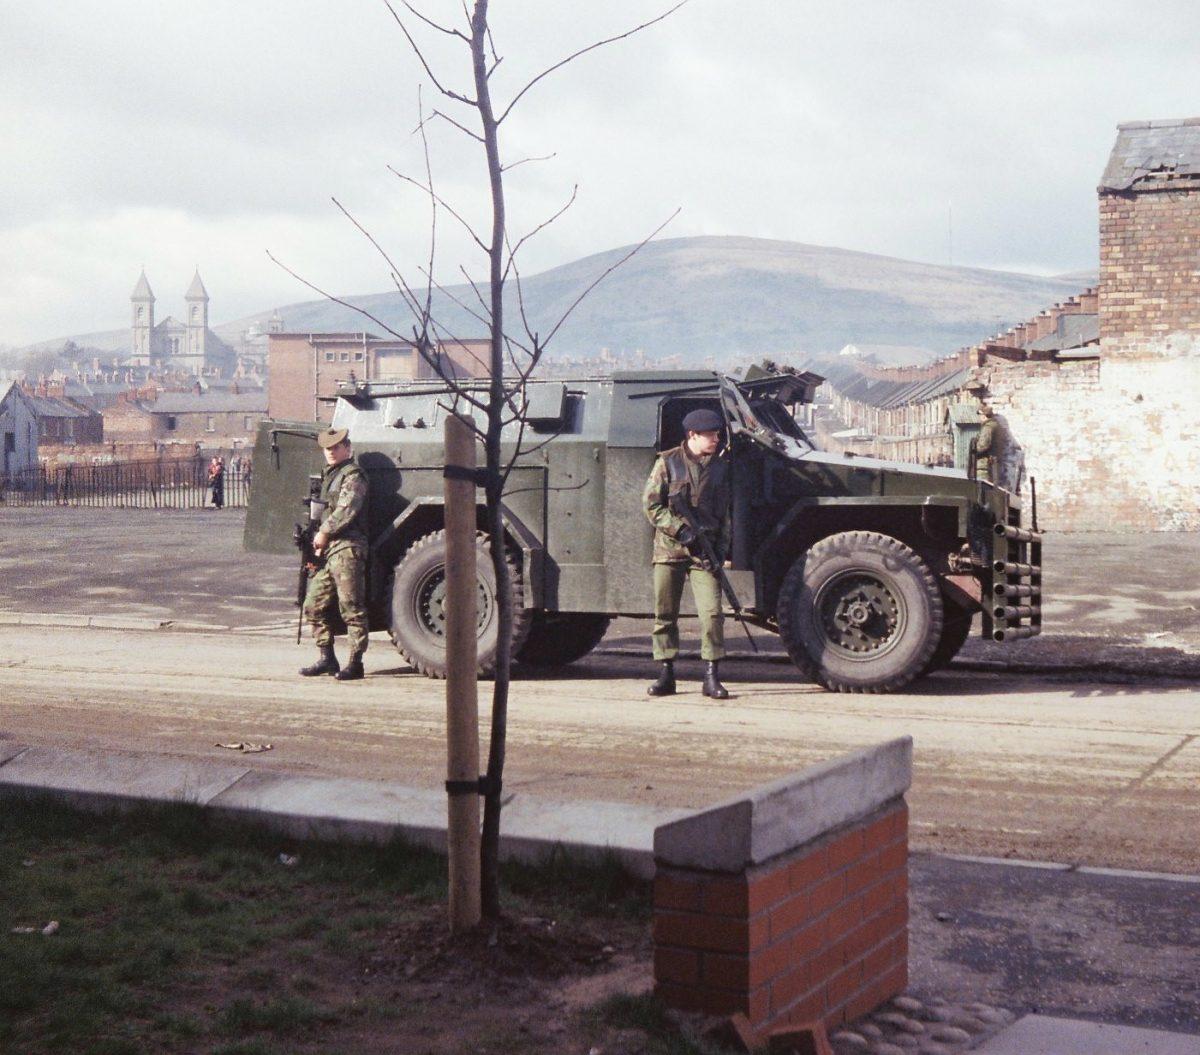 Etna-Waste.-Ardoyne.-Belfast-Gordon-Highlanders-On-a-Patrol-in-Belfast-19778-1200x1055.jpg